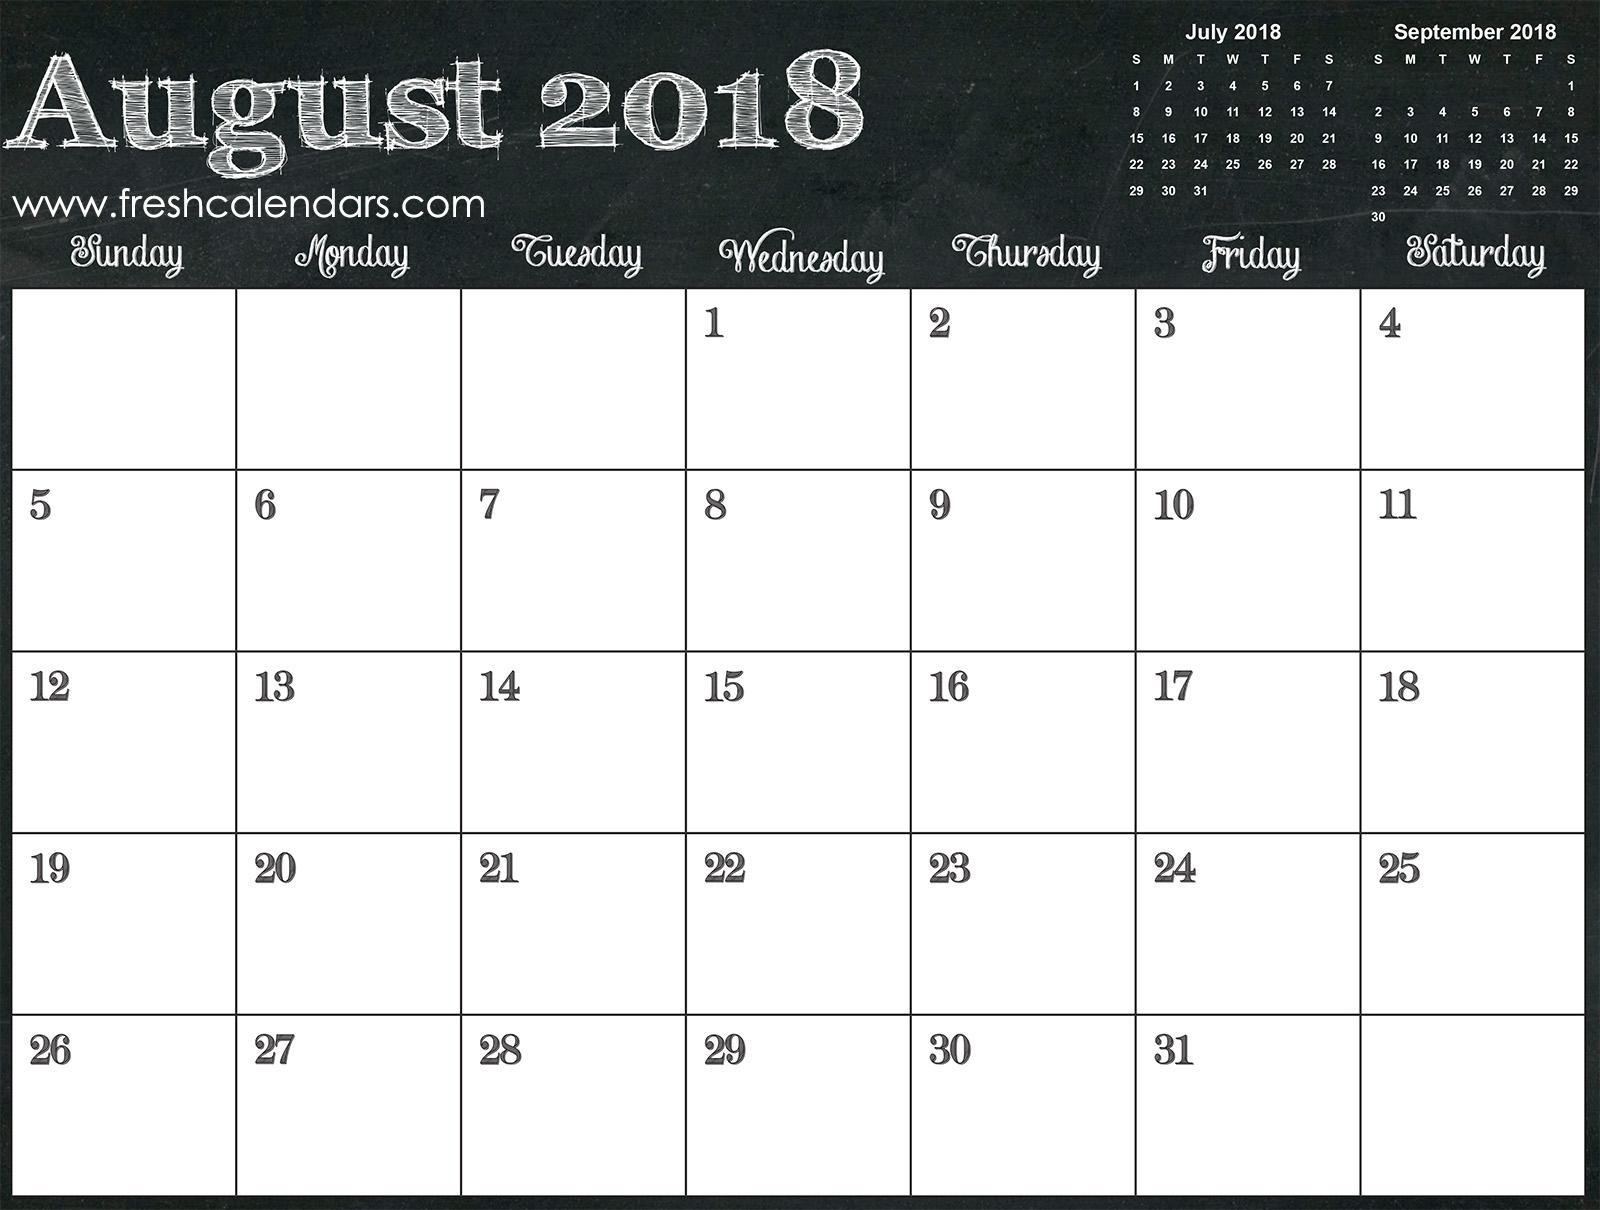 August 2018 Calendar Printable - Fresh Calendars inside Numbers Free Printable Calendar For August